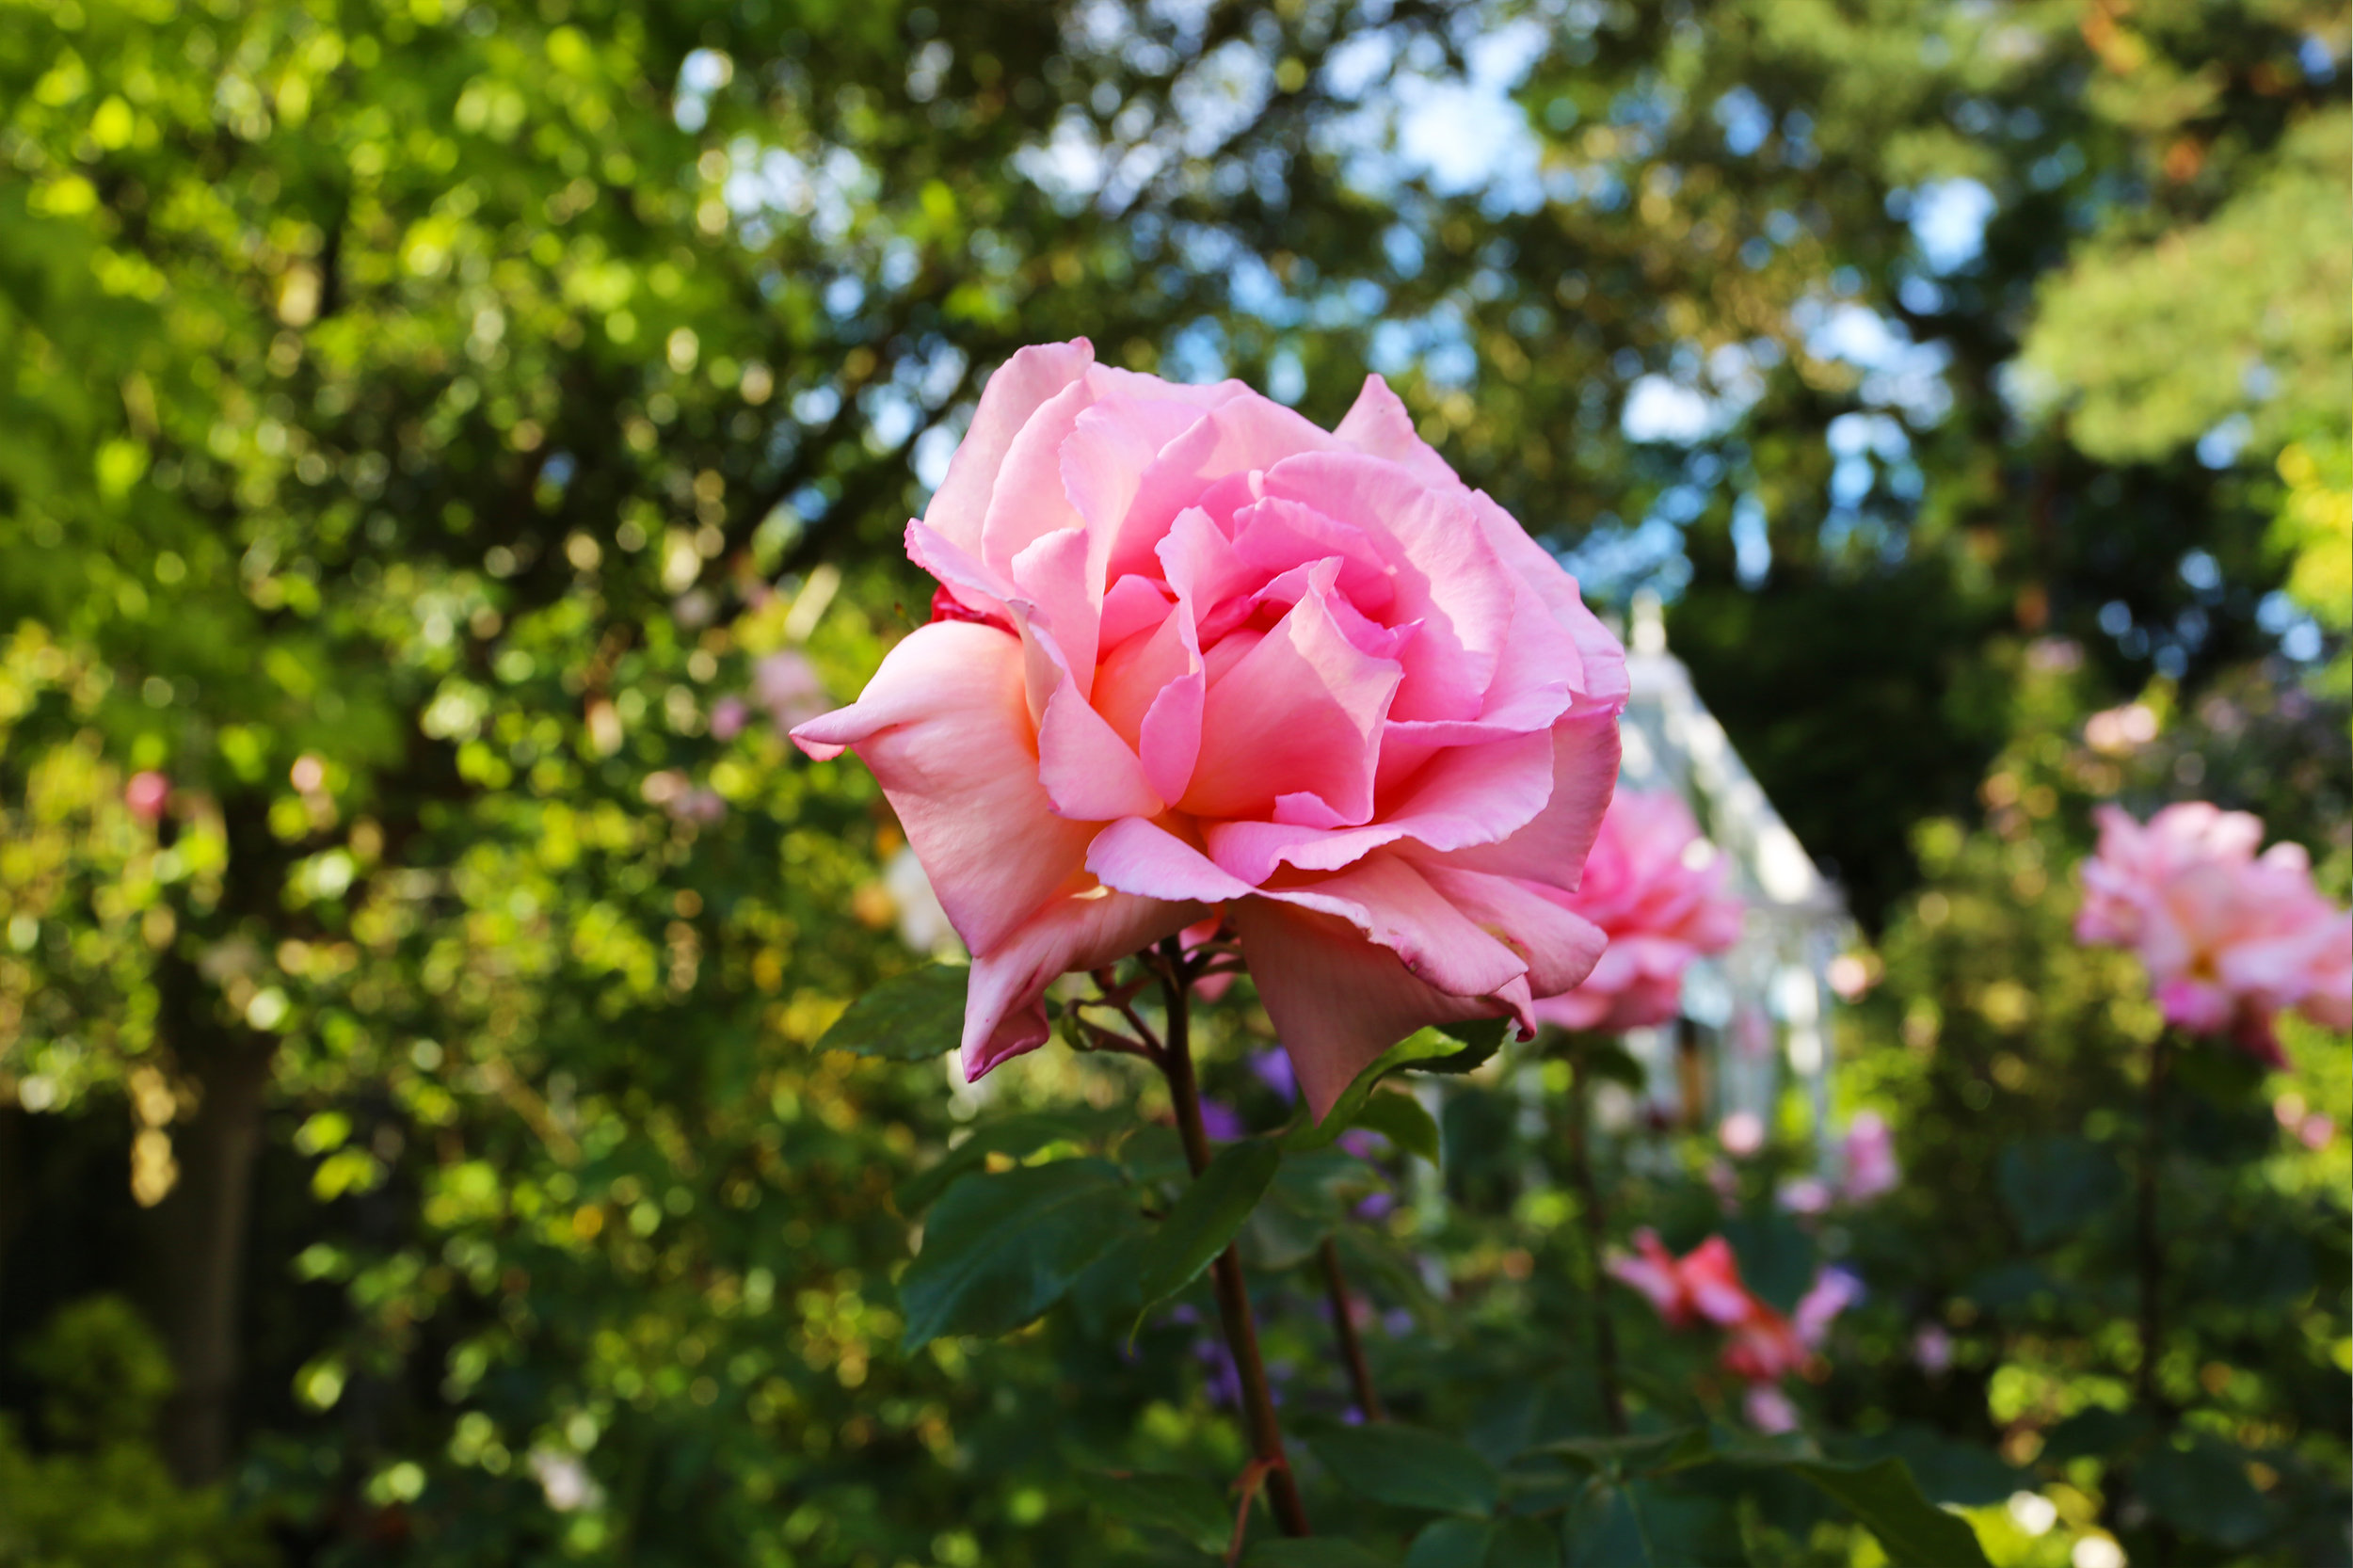 rose_blossom_pink.jpg